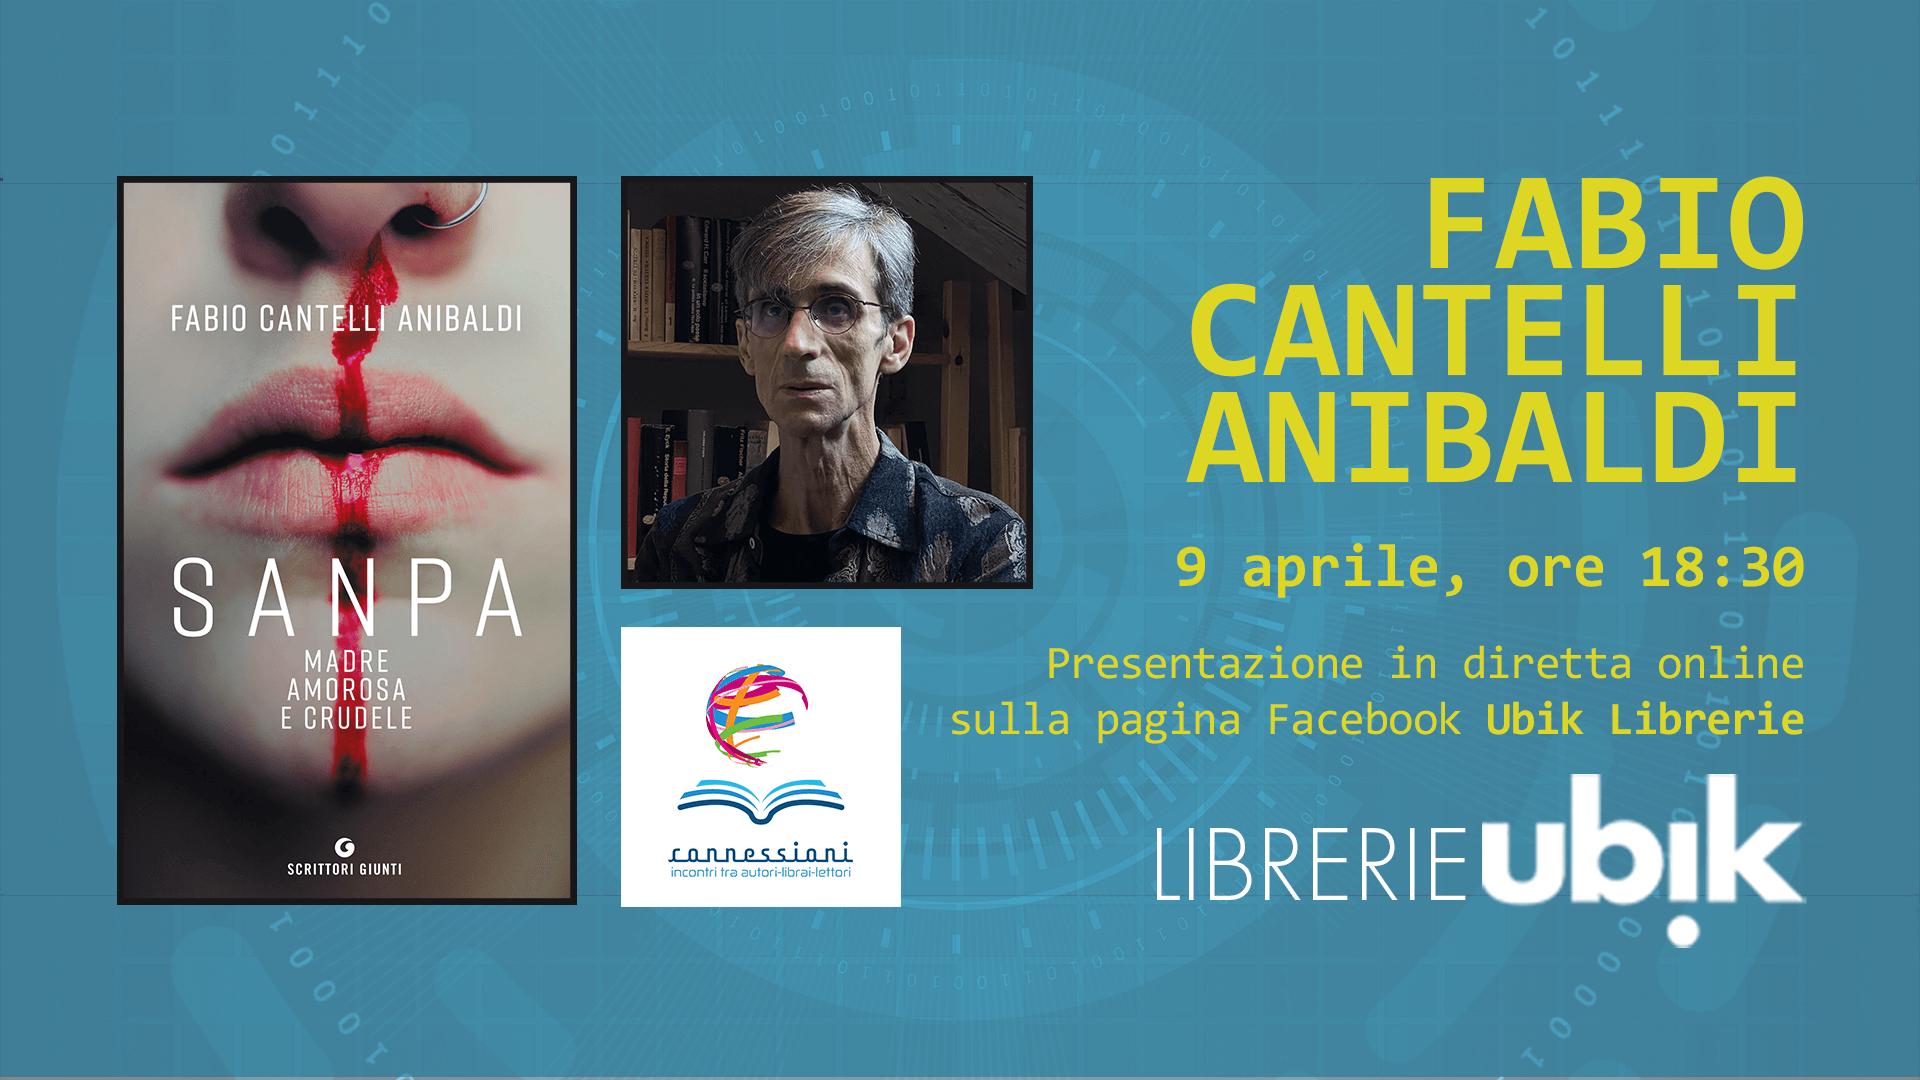 FABIO CANTELLI ANIBALDI presenta in diretta online